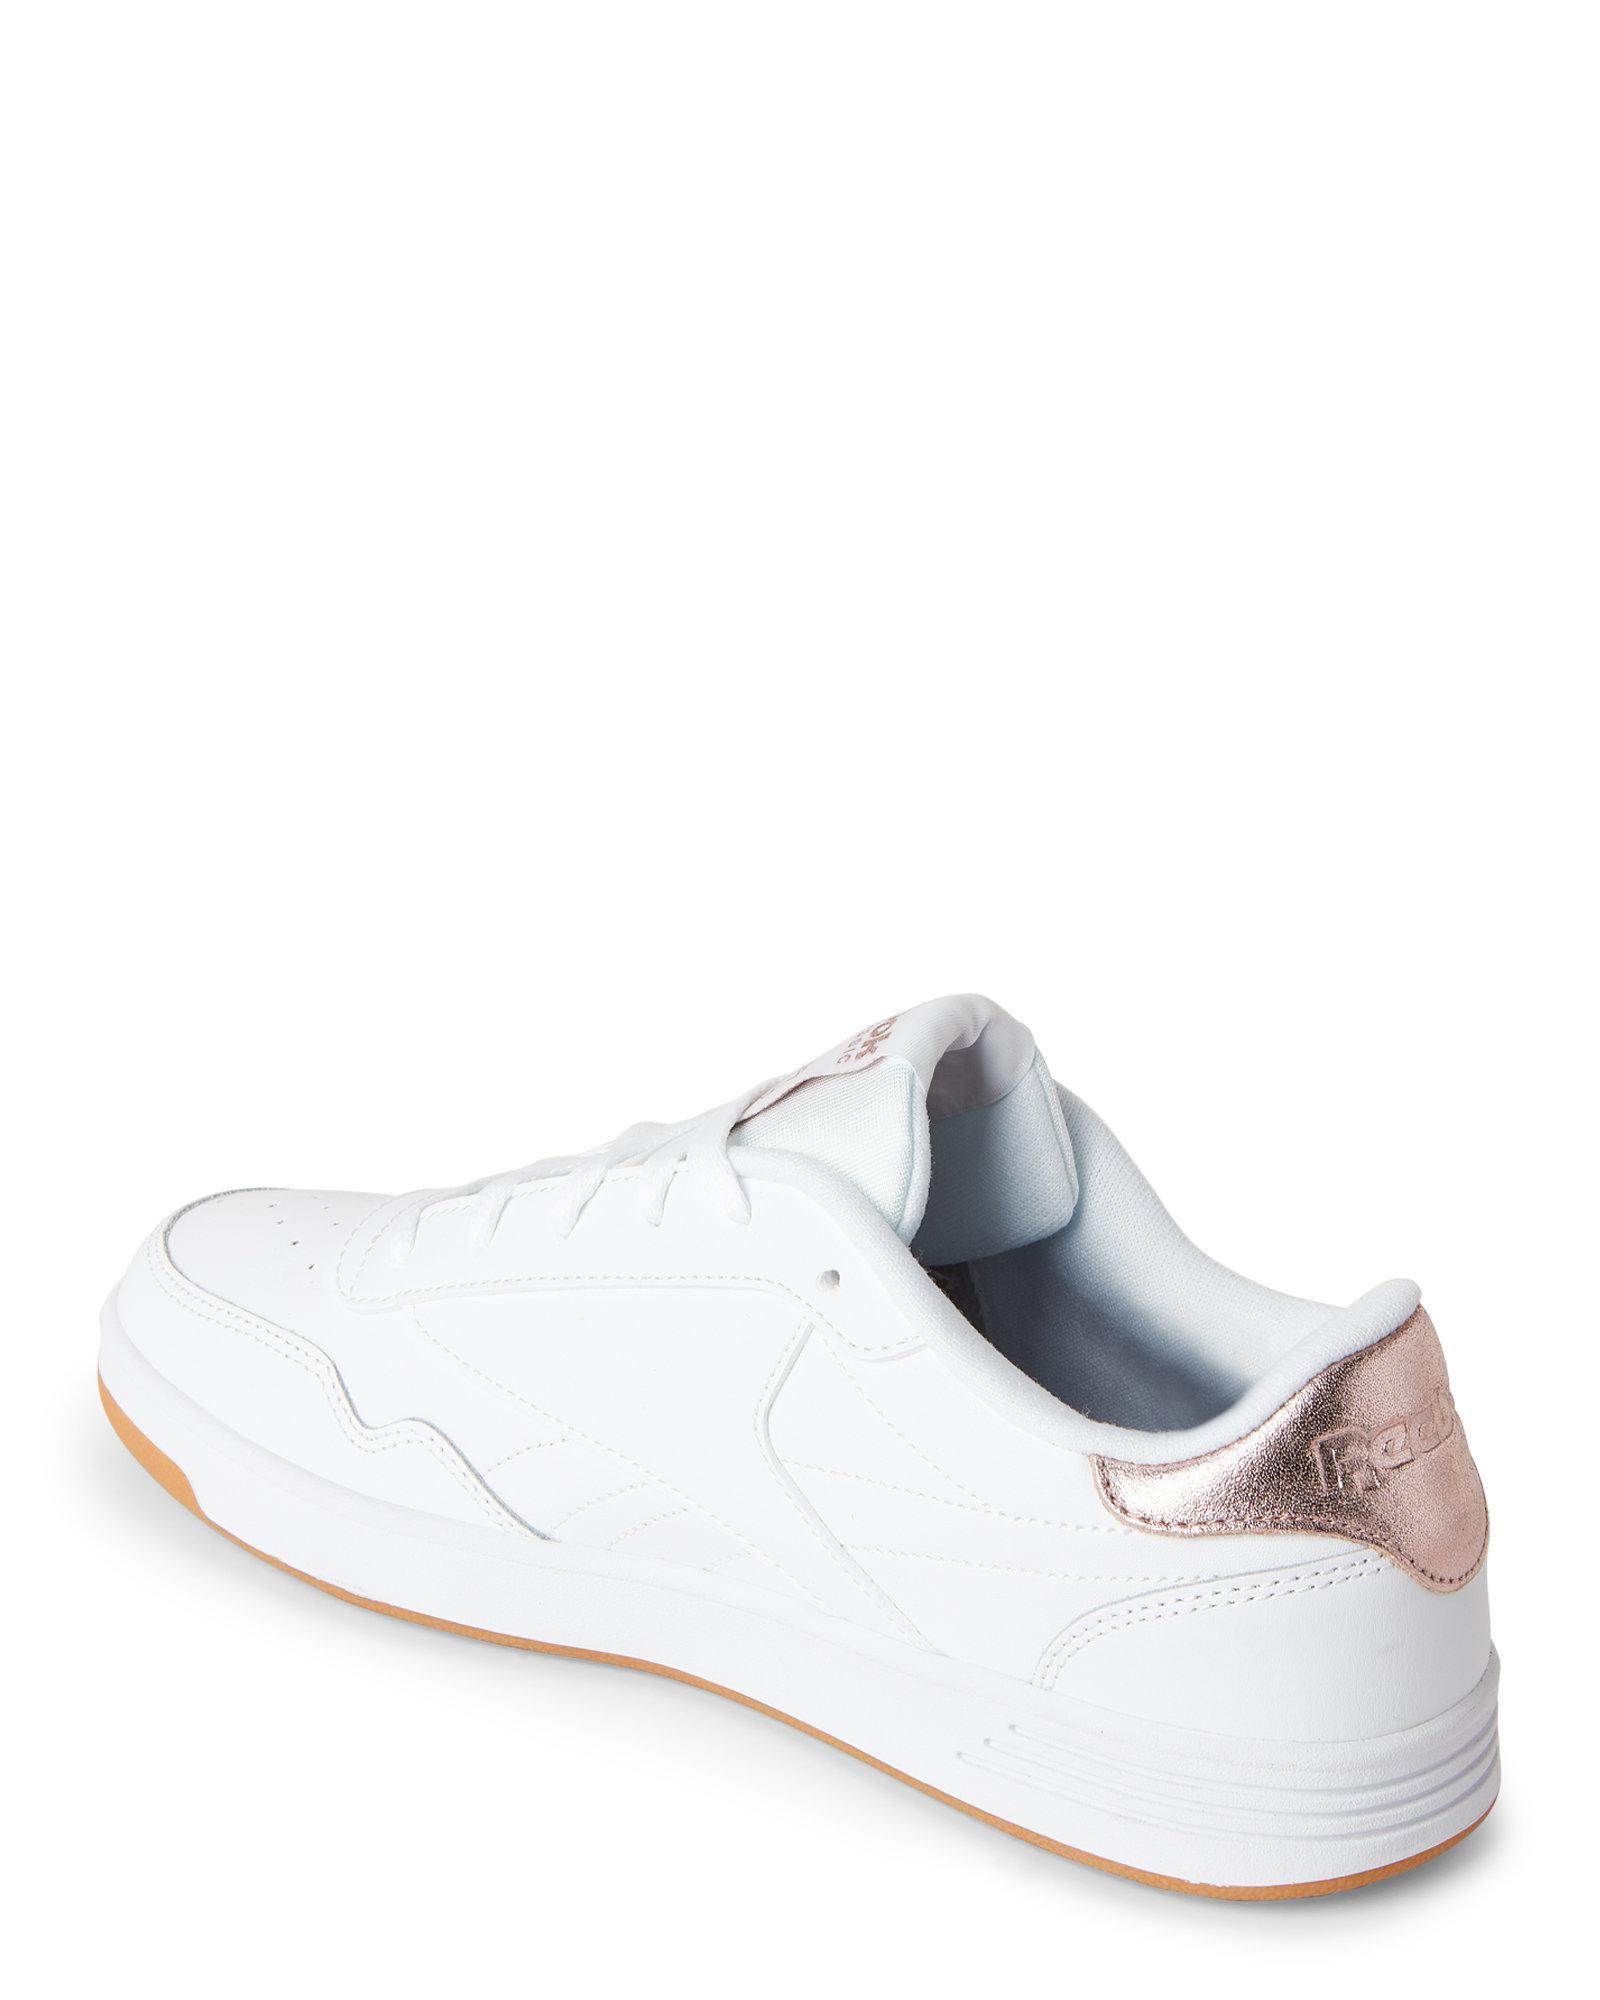 62c71502d2c7 Lyst - Reebok White Club Memt Sneakers in White